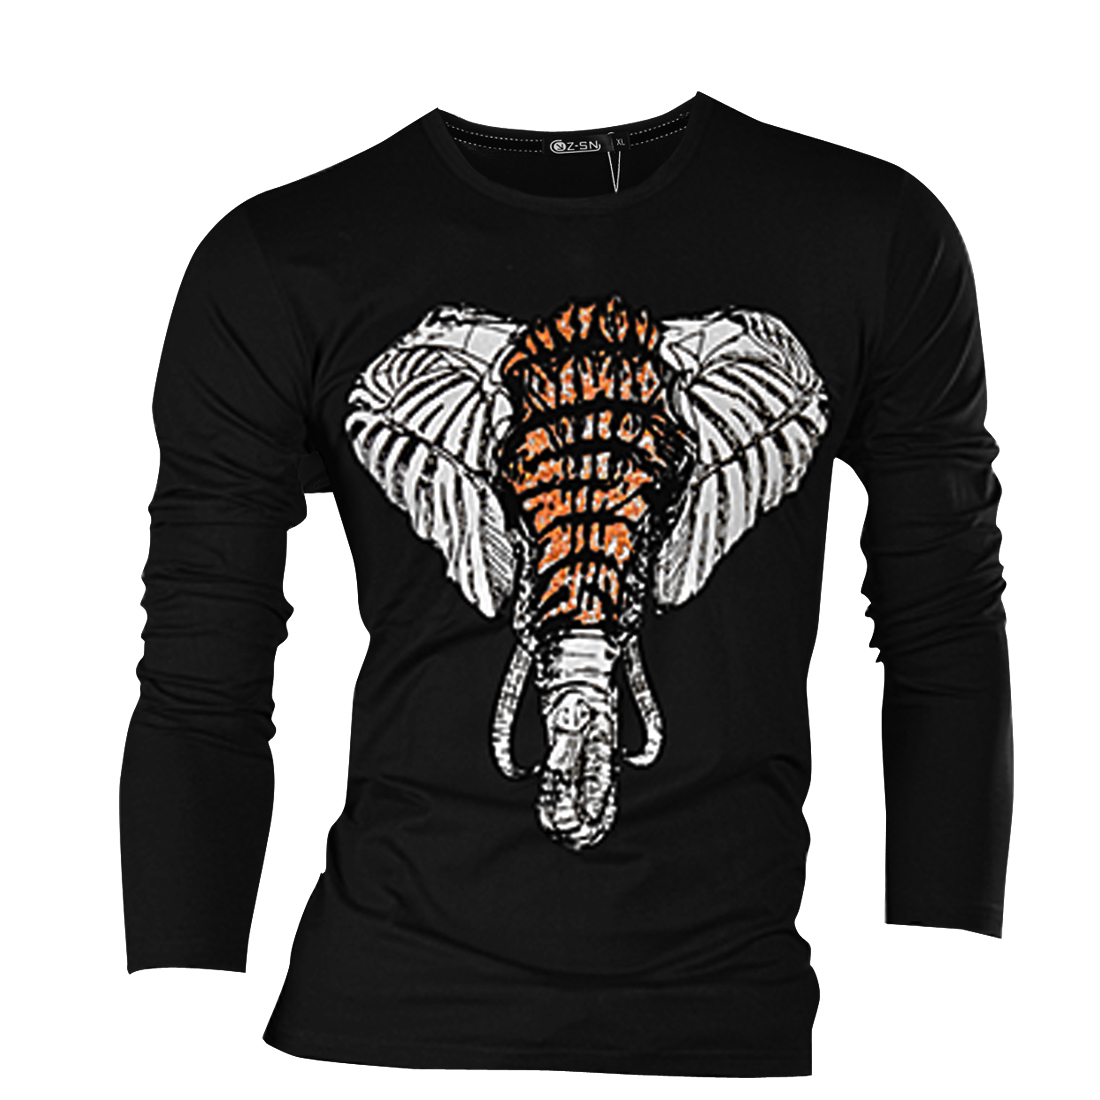 Men Round Neck Long Sleeve Chic Elephant Pattern Black T-Shirt S